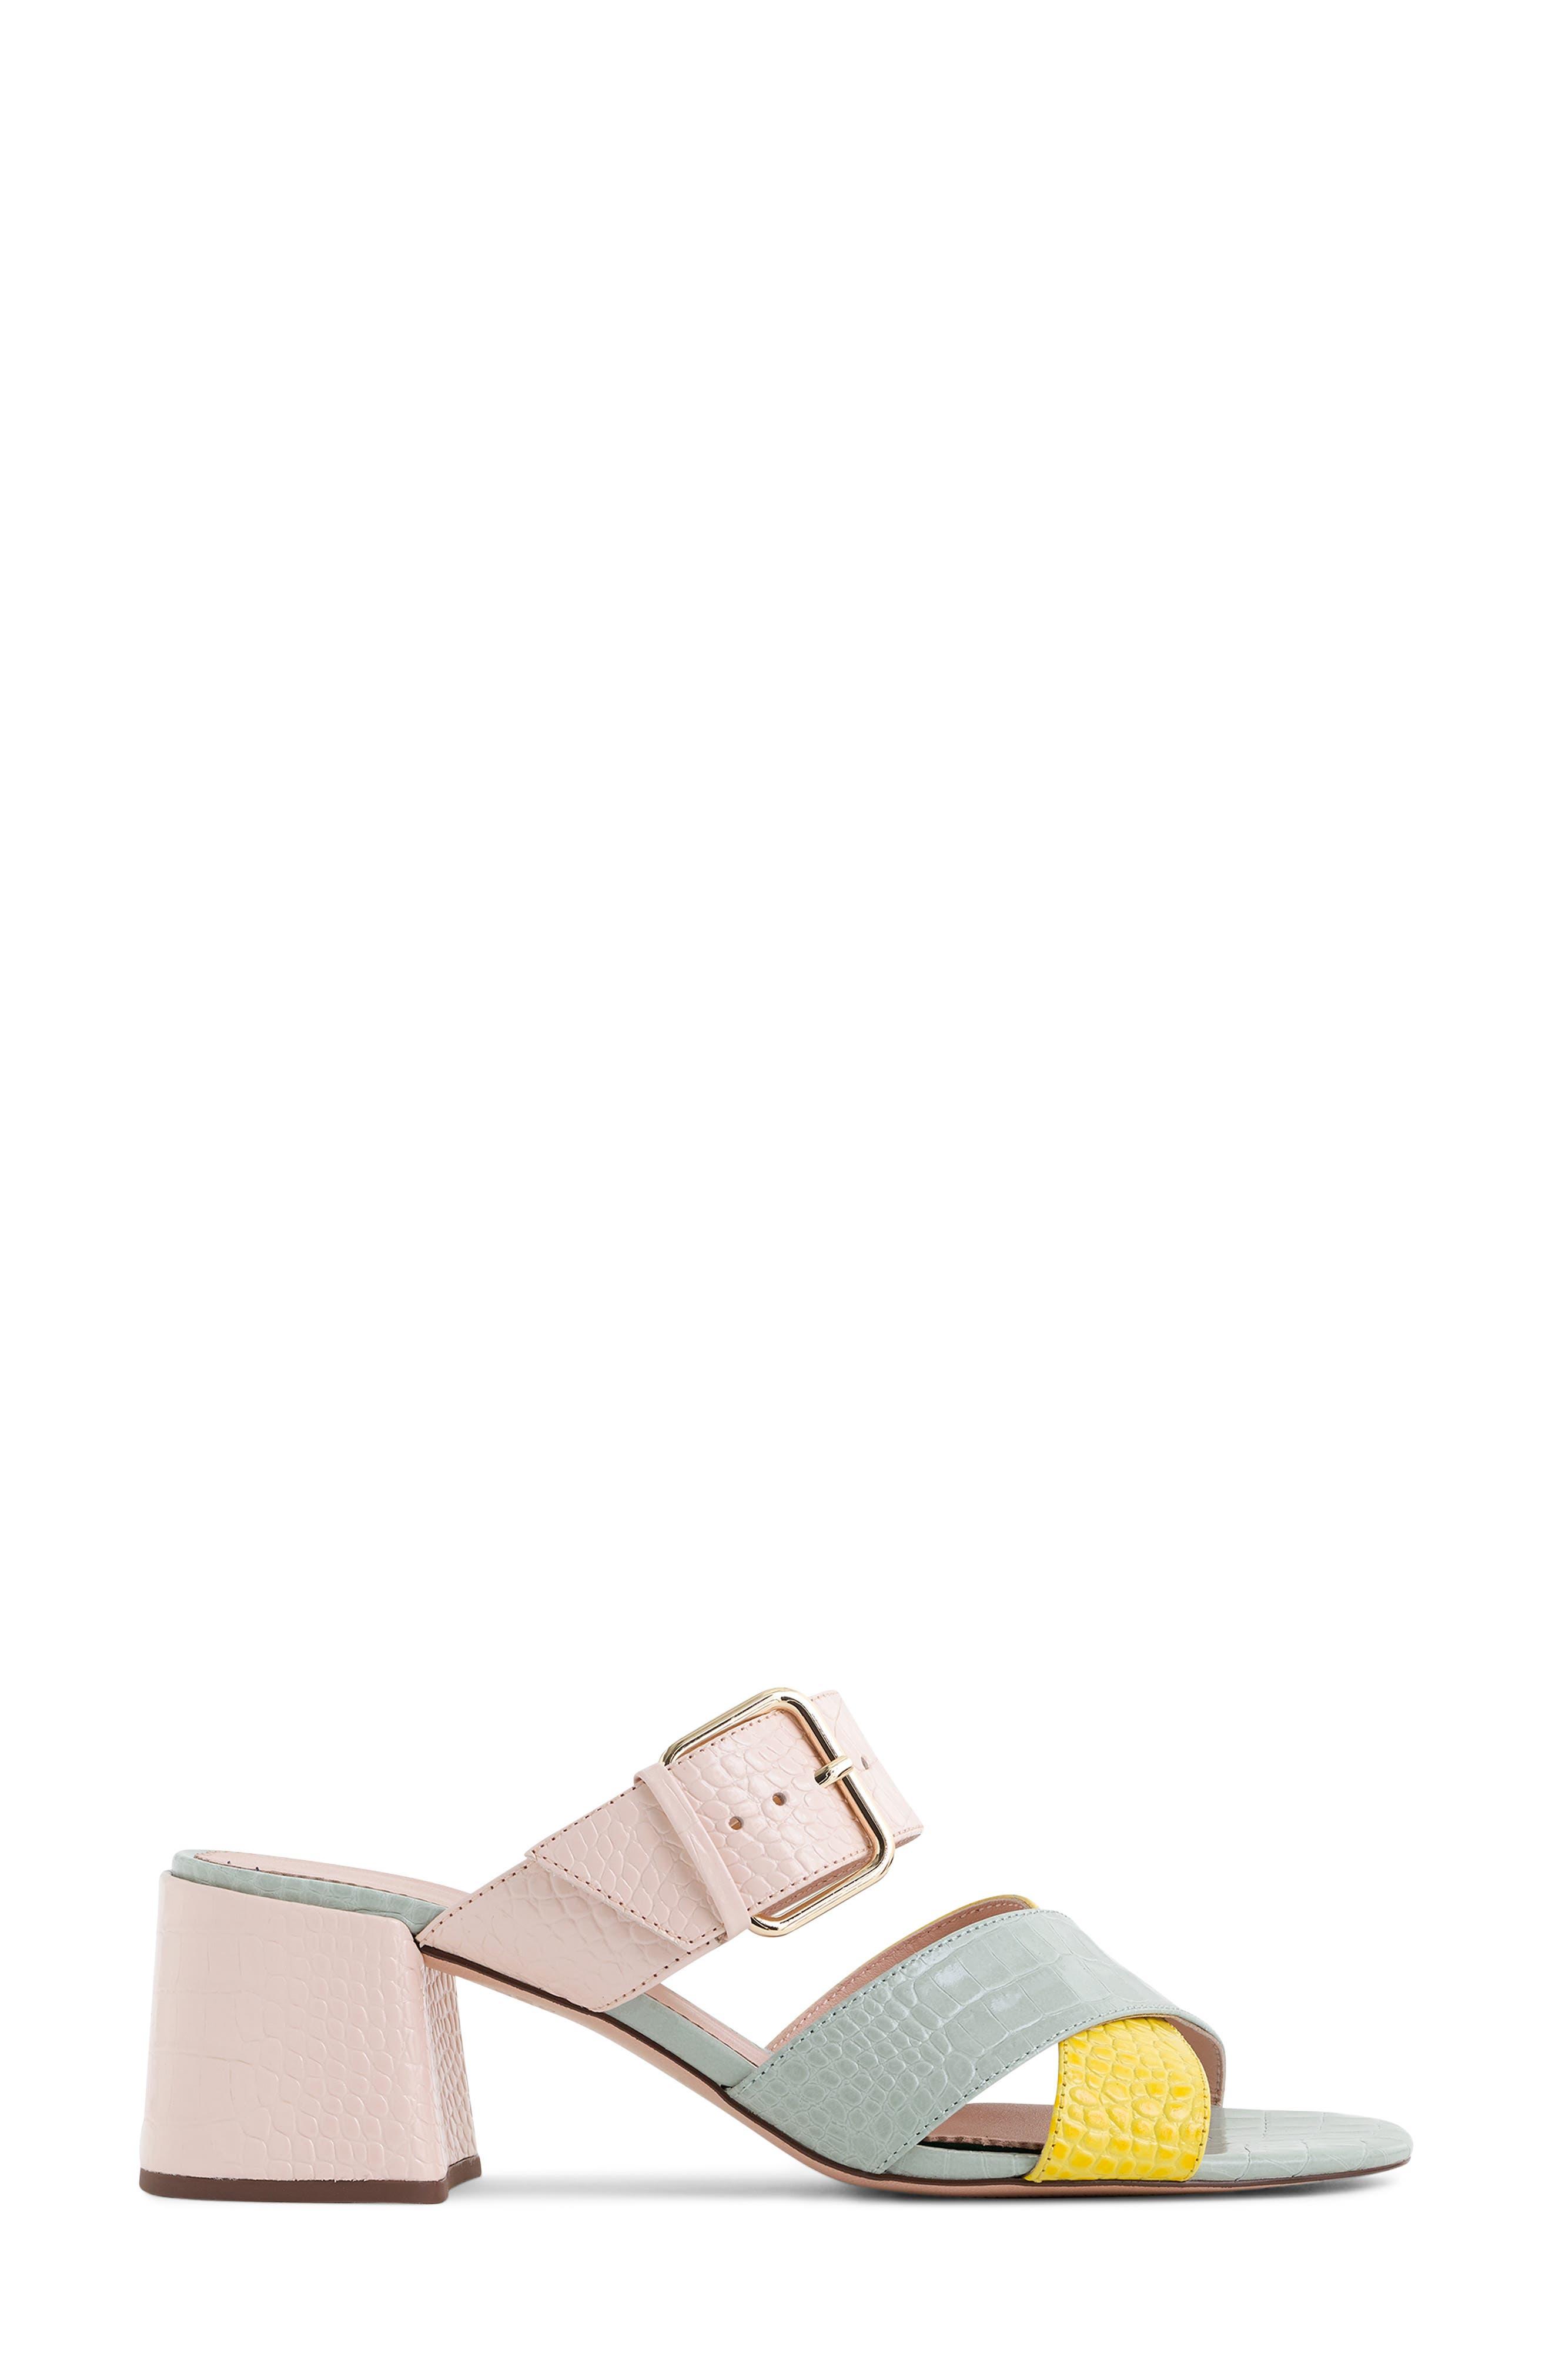 Penny Colorblock Faux Croc Slide Sandal,                             Alternate thumbnail 2, color,                             BRIGHT YOLK SUEDE